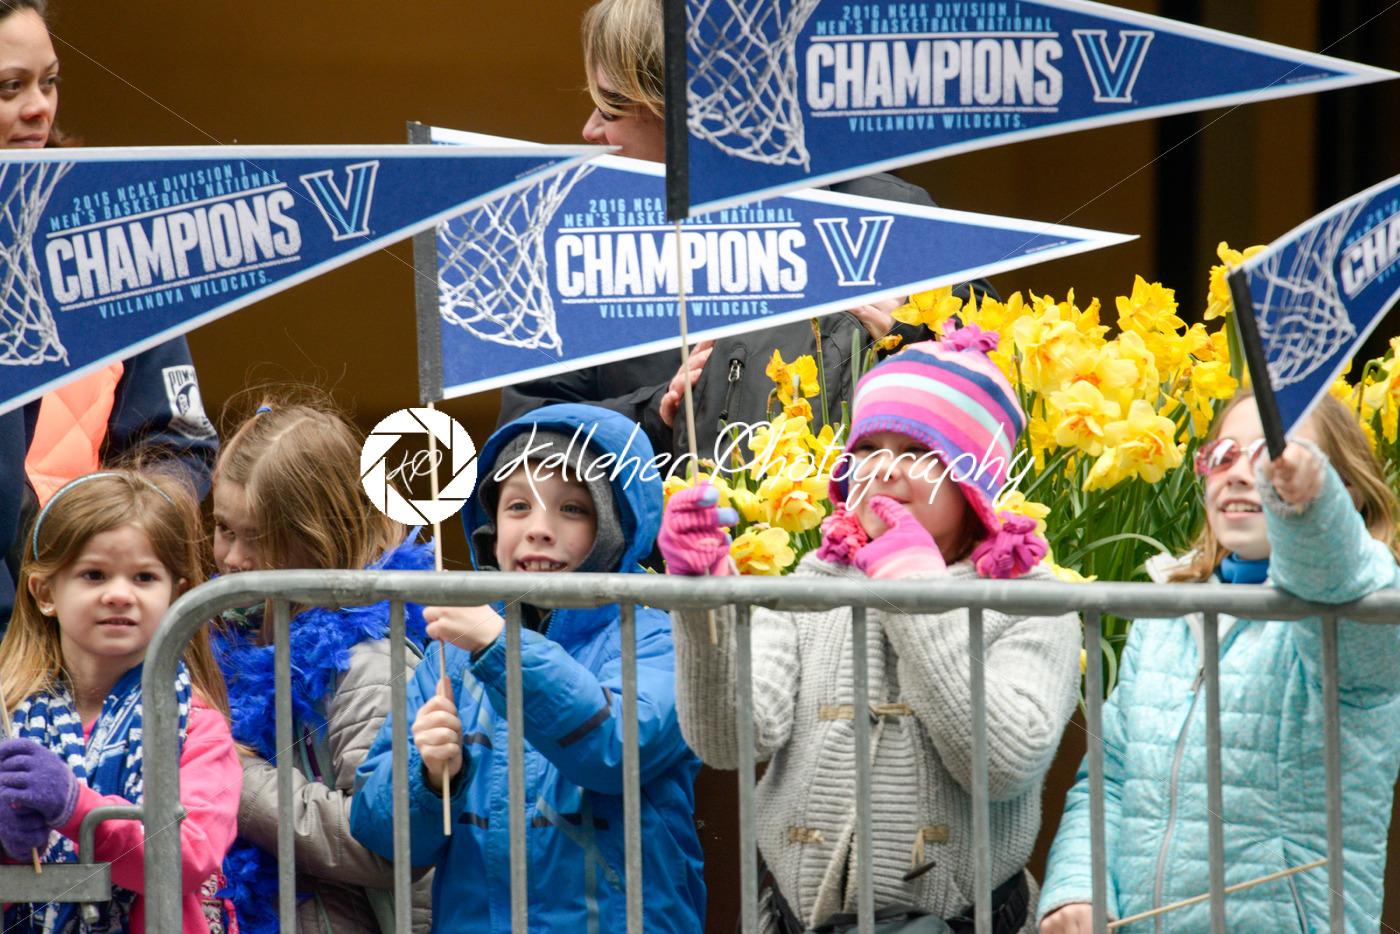 PHILADELPHIA, PA – APRIL 8: Celebration Parade for Villanova Men's Basketball Team, 2016 NCAA Champions on April 8, 2016 - Kelleher Photography Store